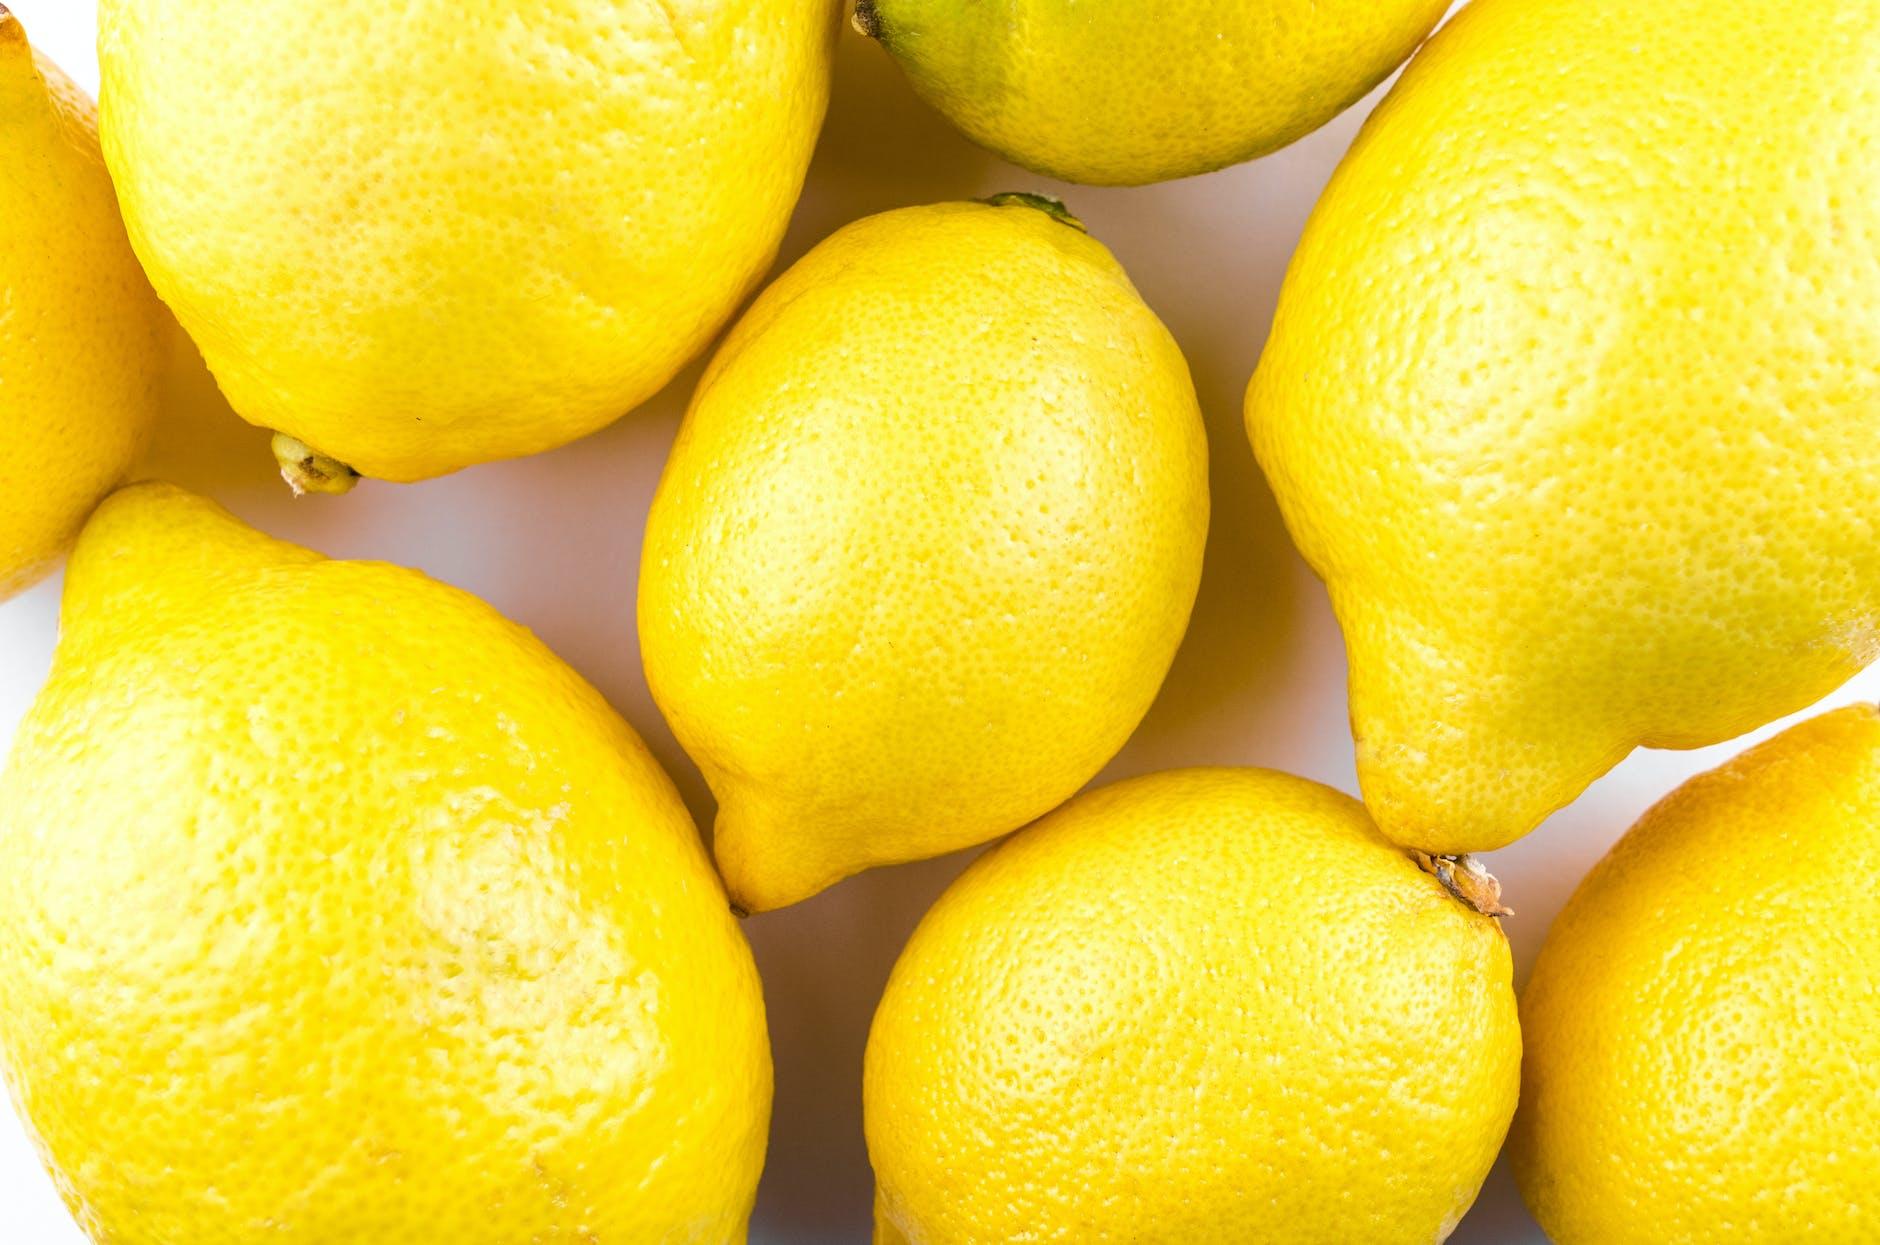 Lemons can repel spiders.